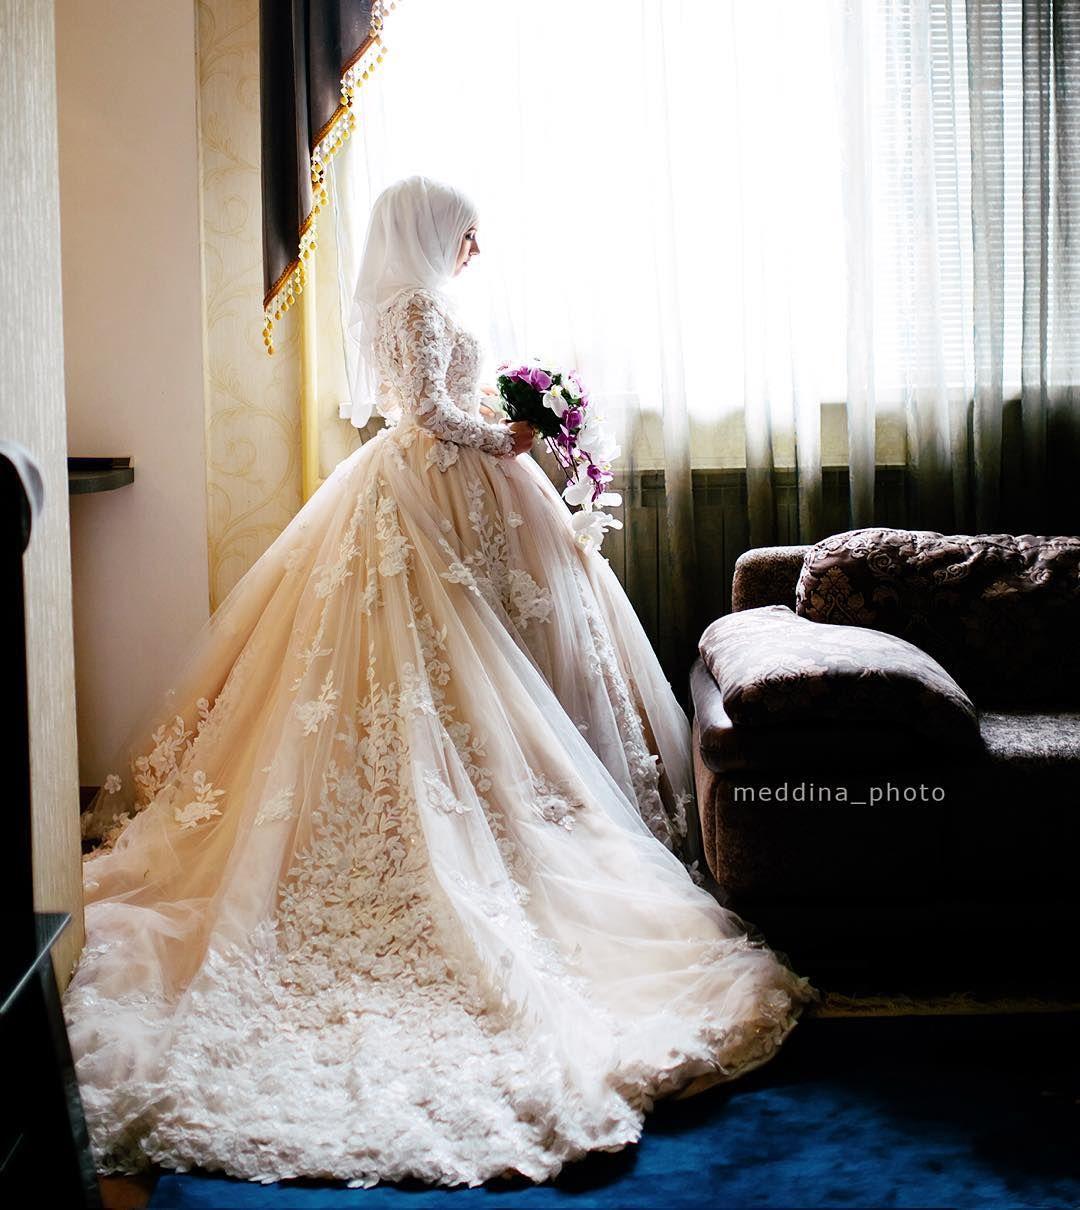 Wedding meddina photographer wedding saloncalina by